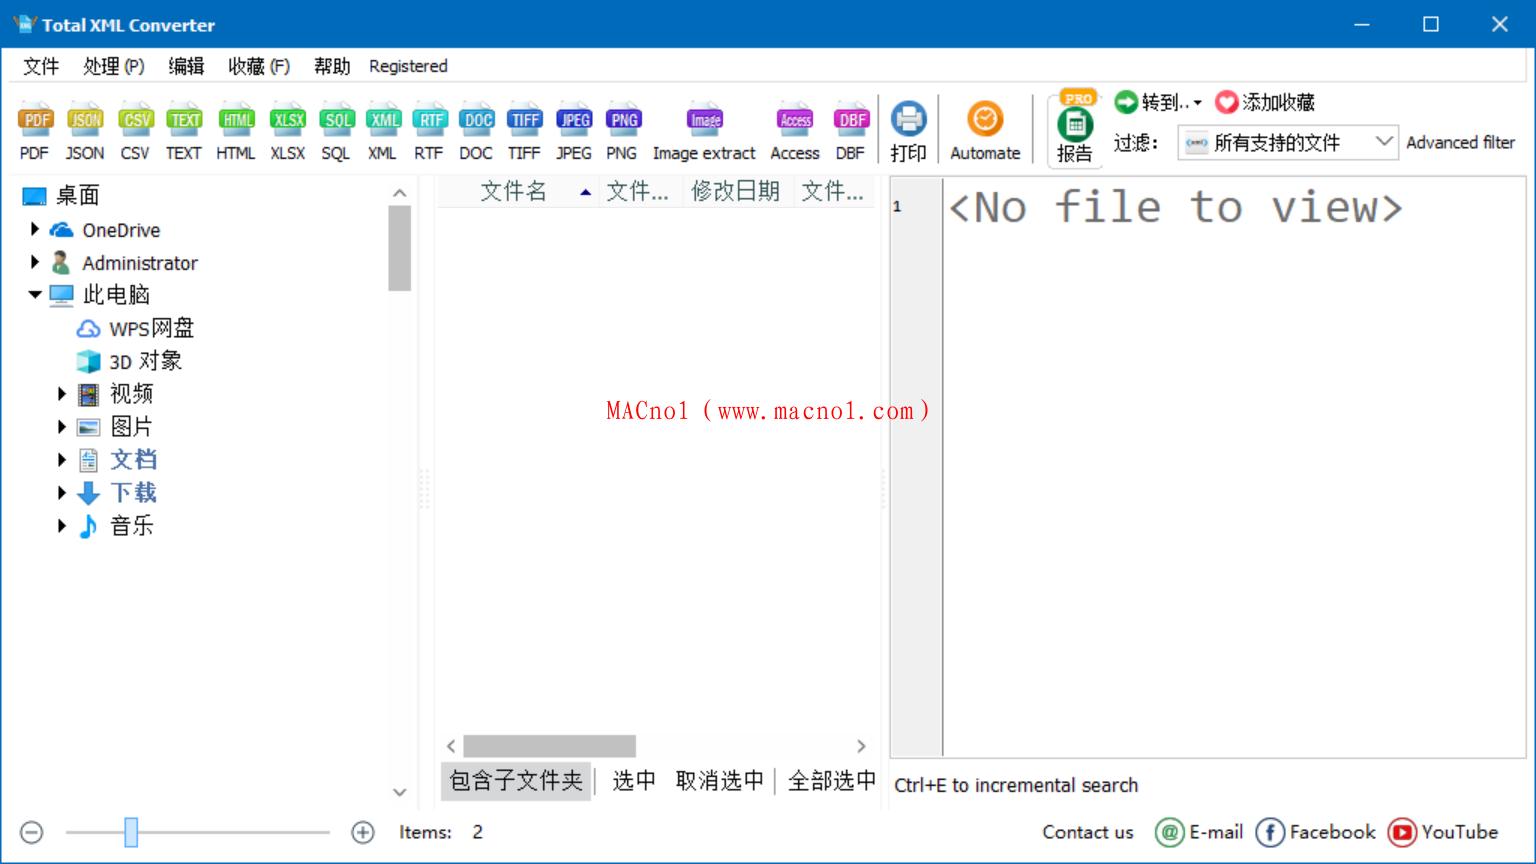 Coolutils Total XML Converter 3.png